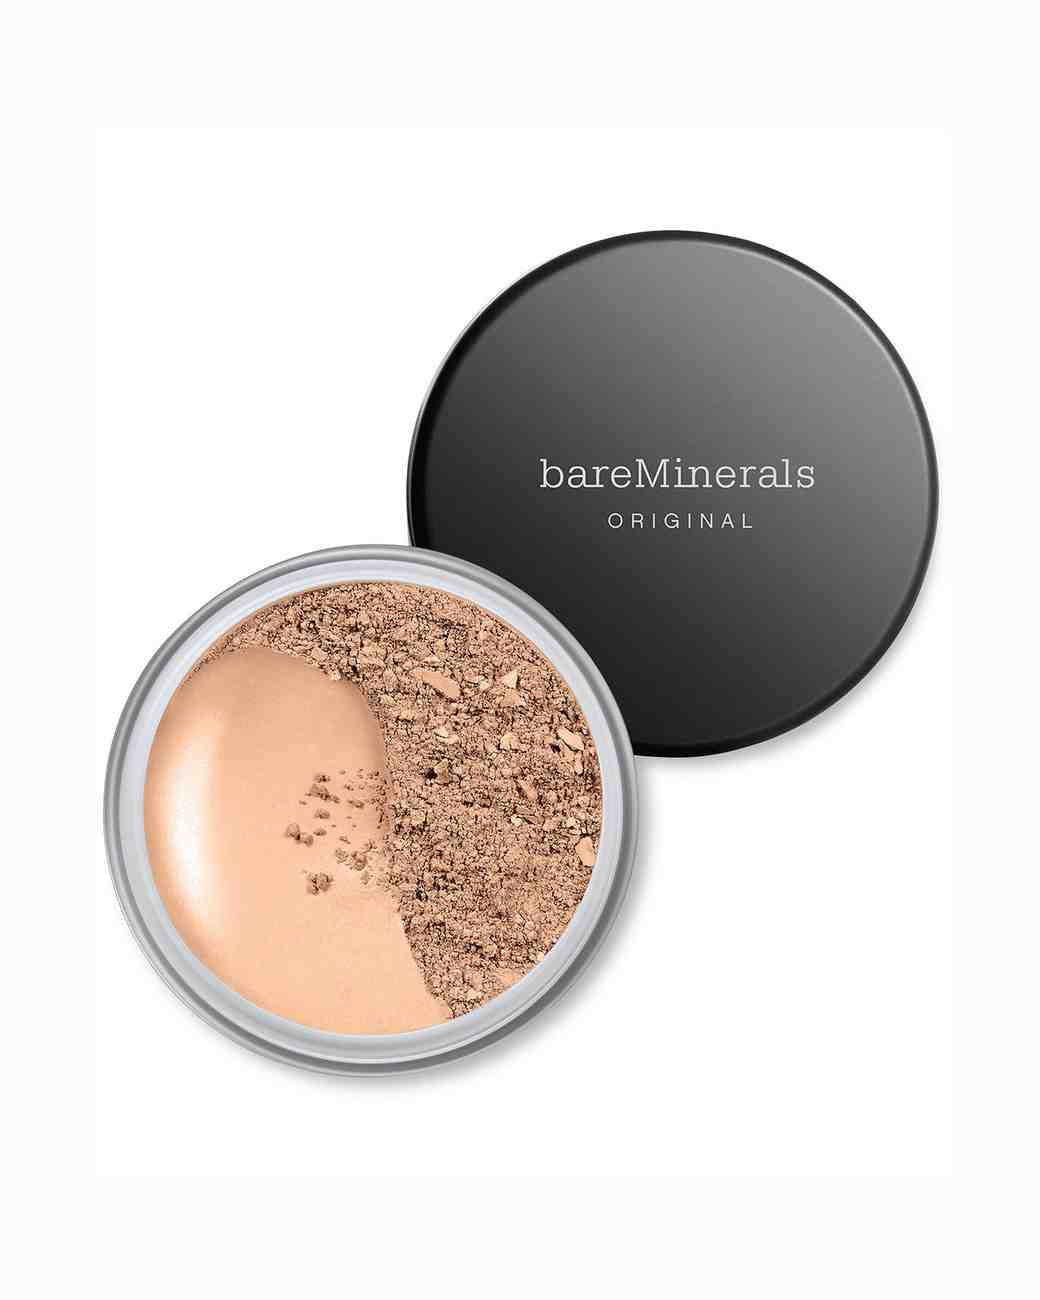 big-day-beauty-awards-bare-minerals-original-foundation-0216.jpg